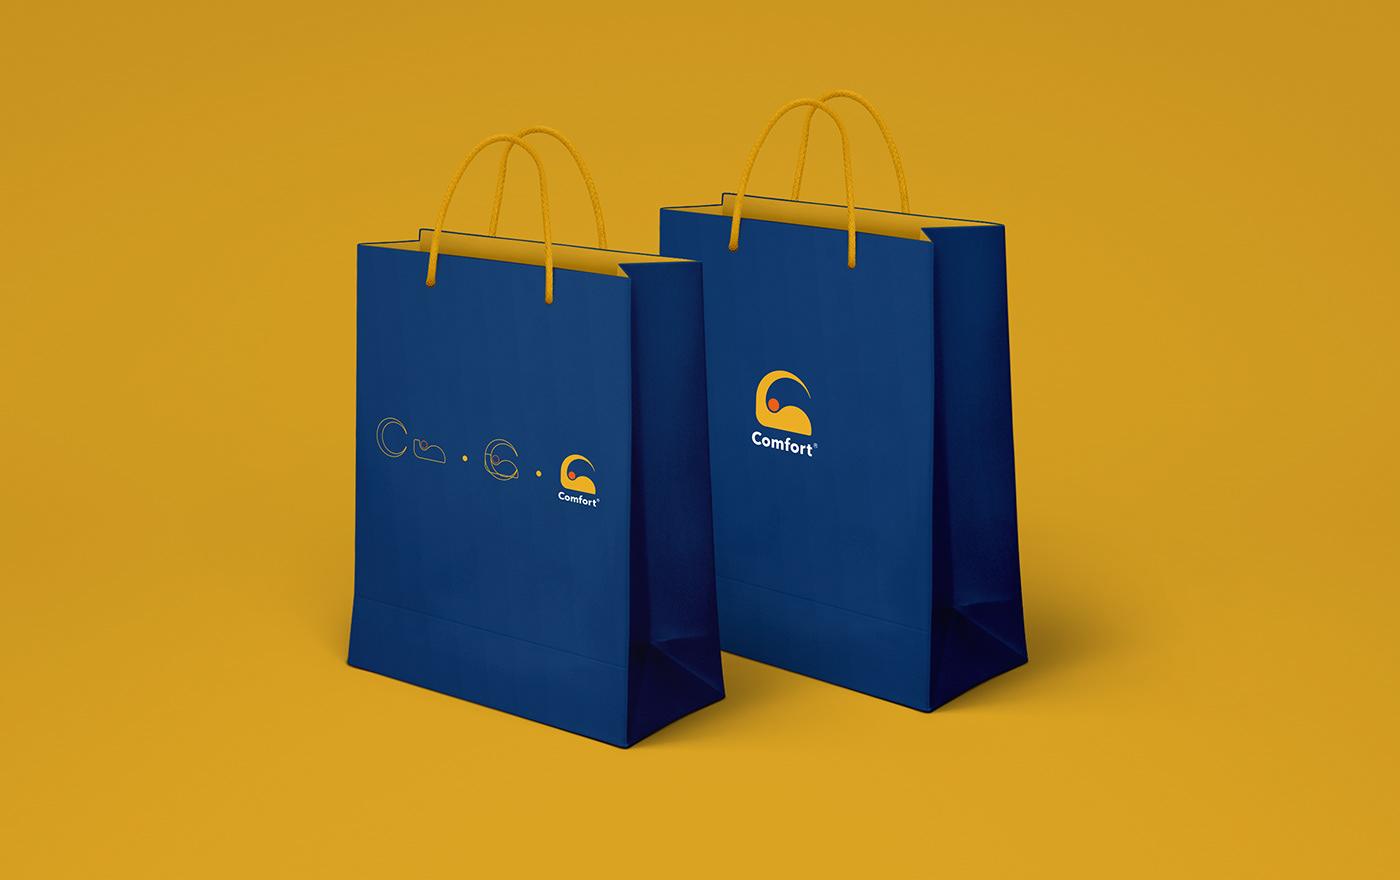 brand brand identity design graphic design  hotel interior design  product design  Rebrending Travel Comfort Inn